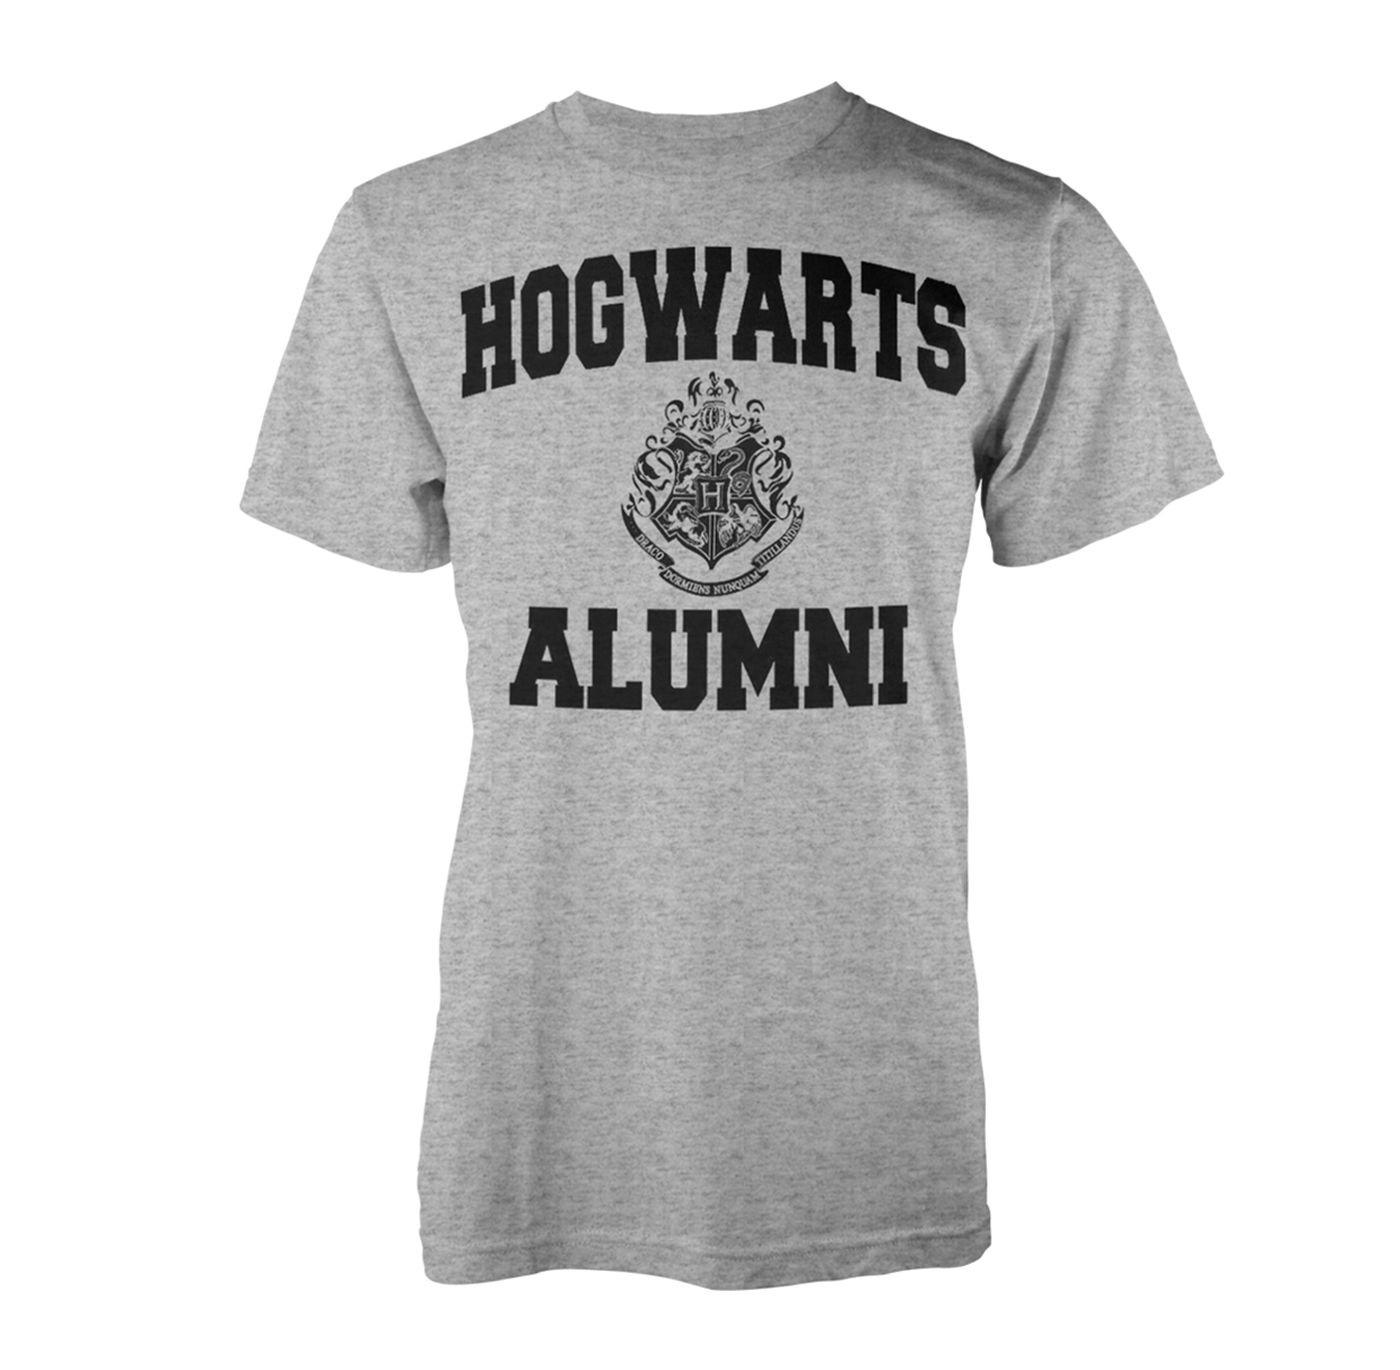 Harry Potter t-shirt - Hogwarts alumni